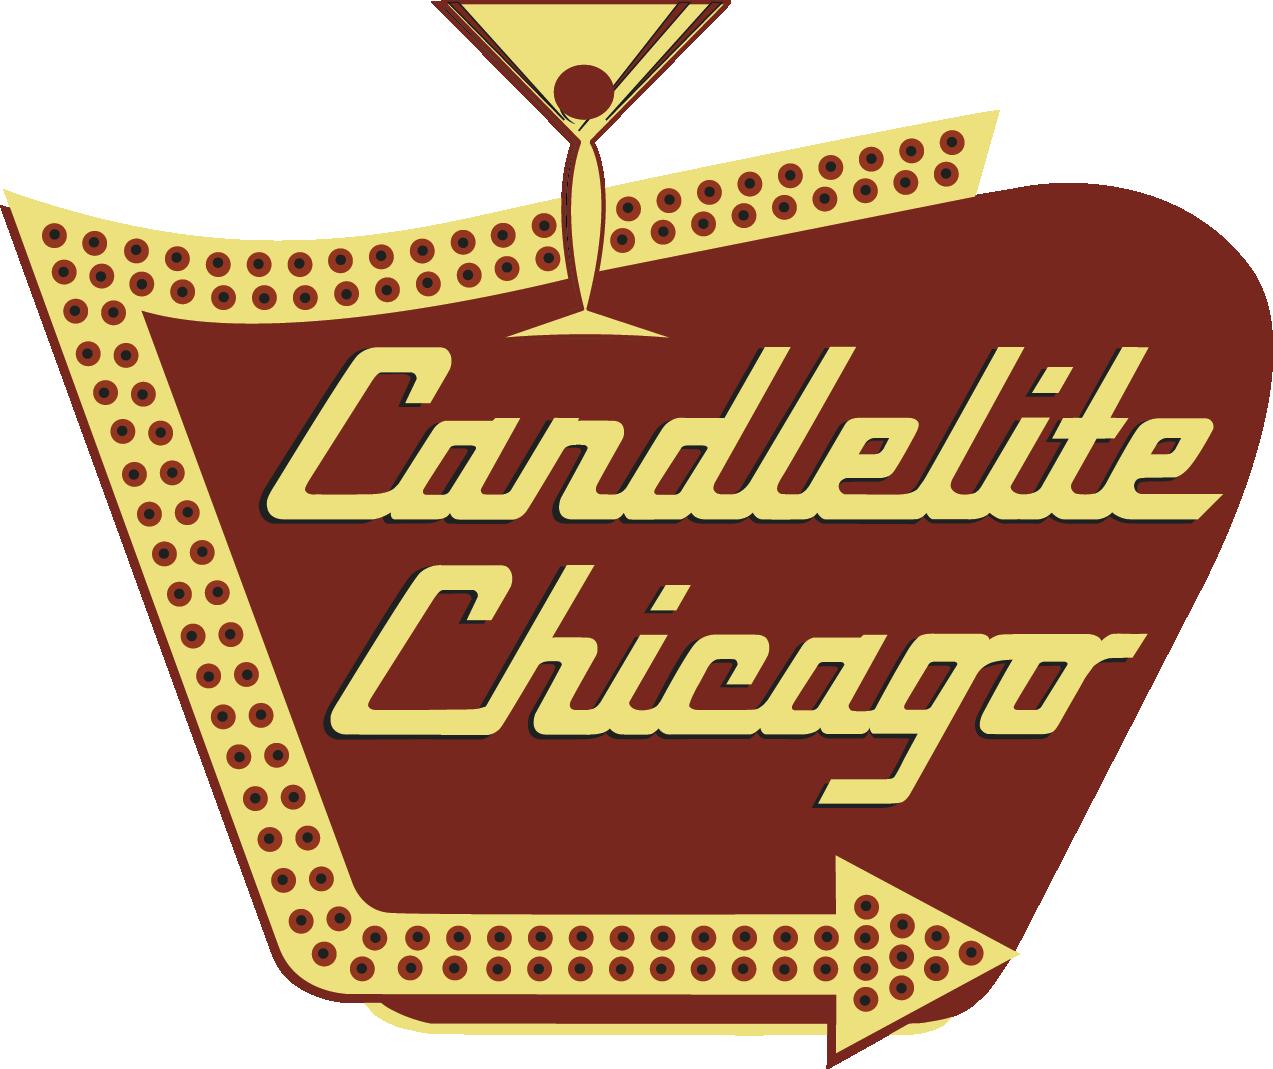 CandleliteLOGO.png